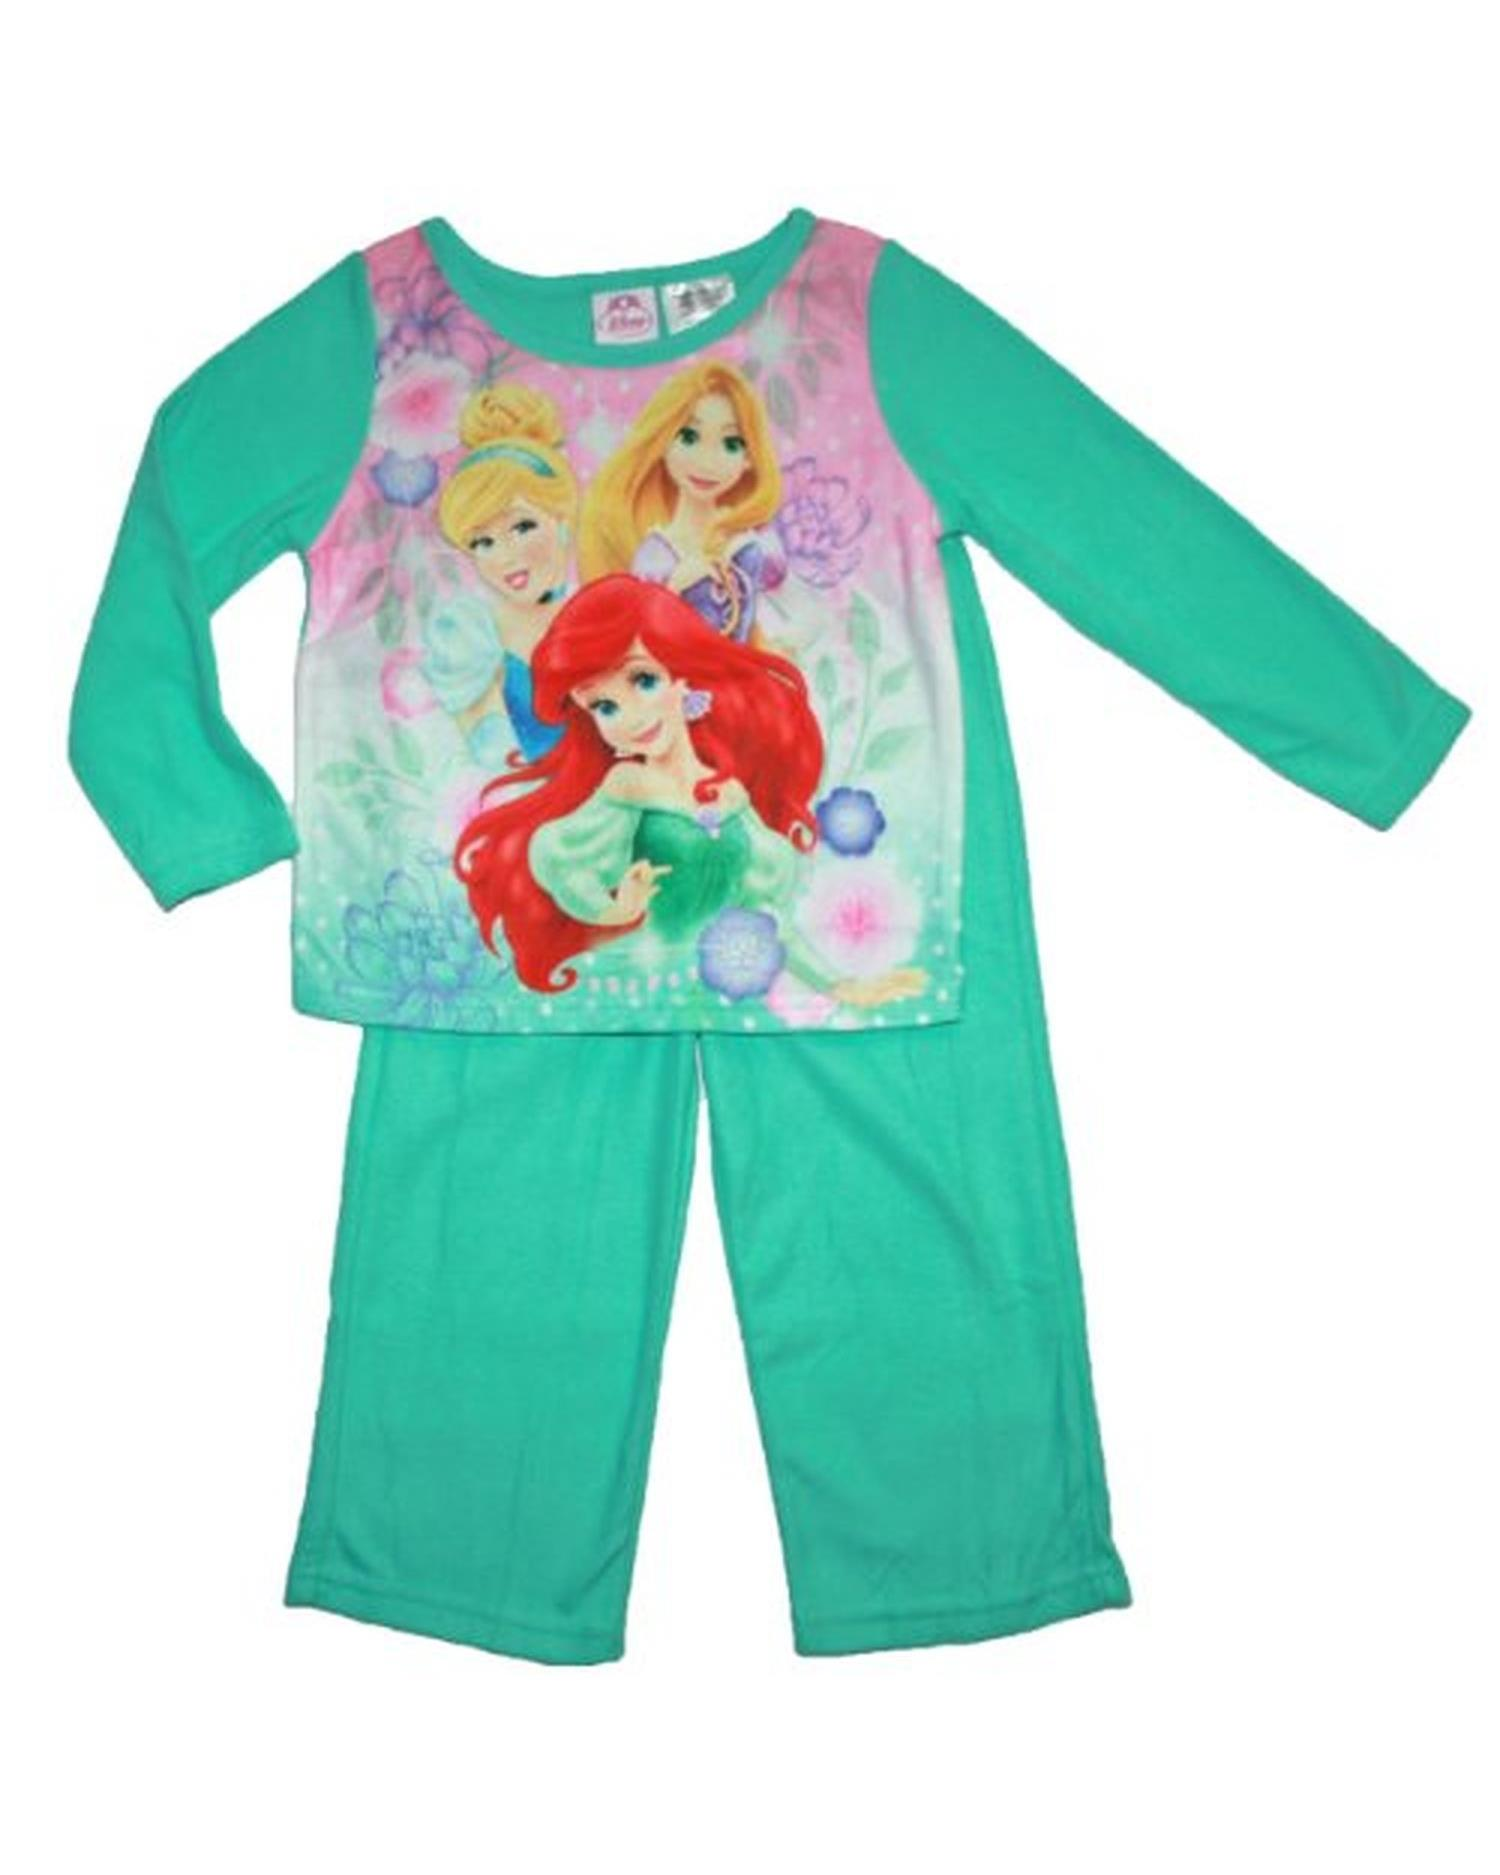 Little Girls' Fleece 2-Piece Pajama Set, 2T-4T, Disney Princess, Size: 3T